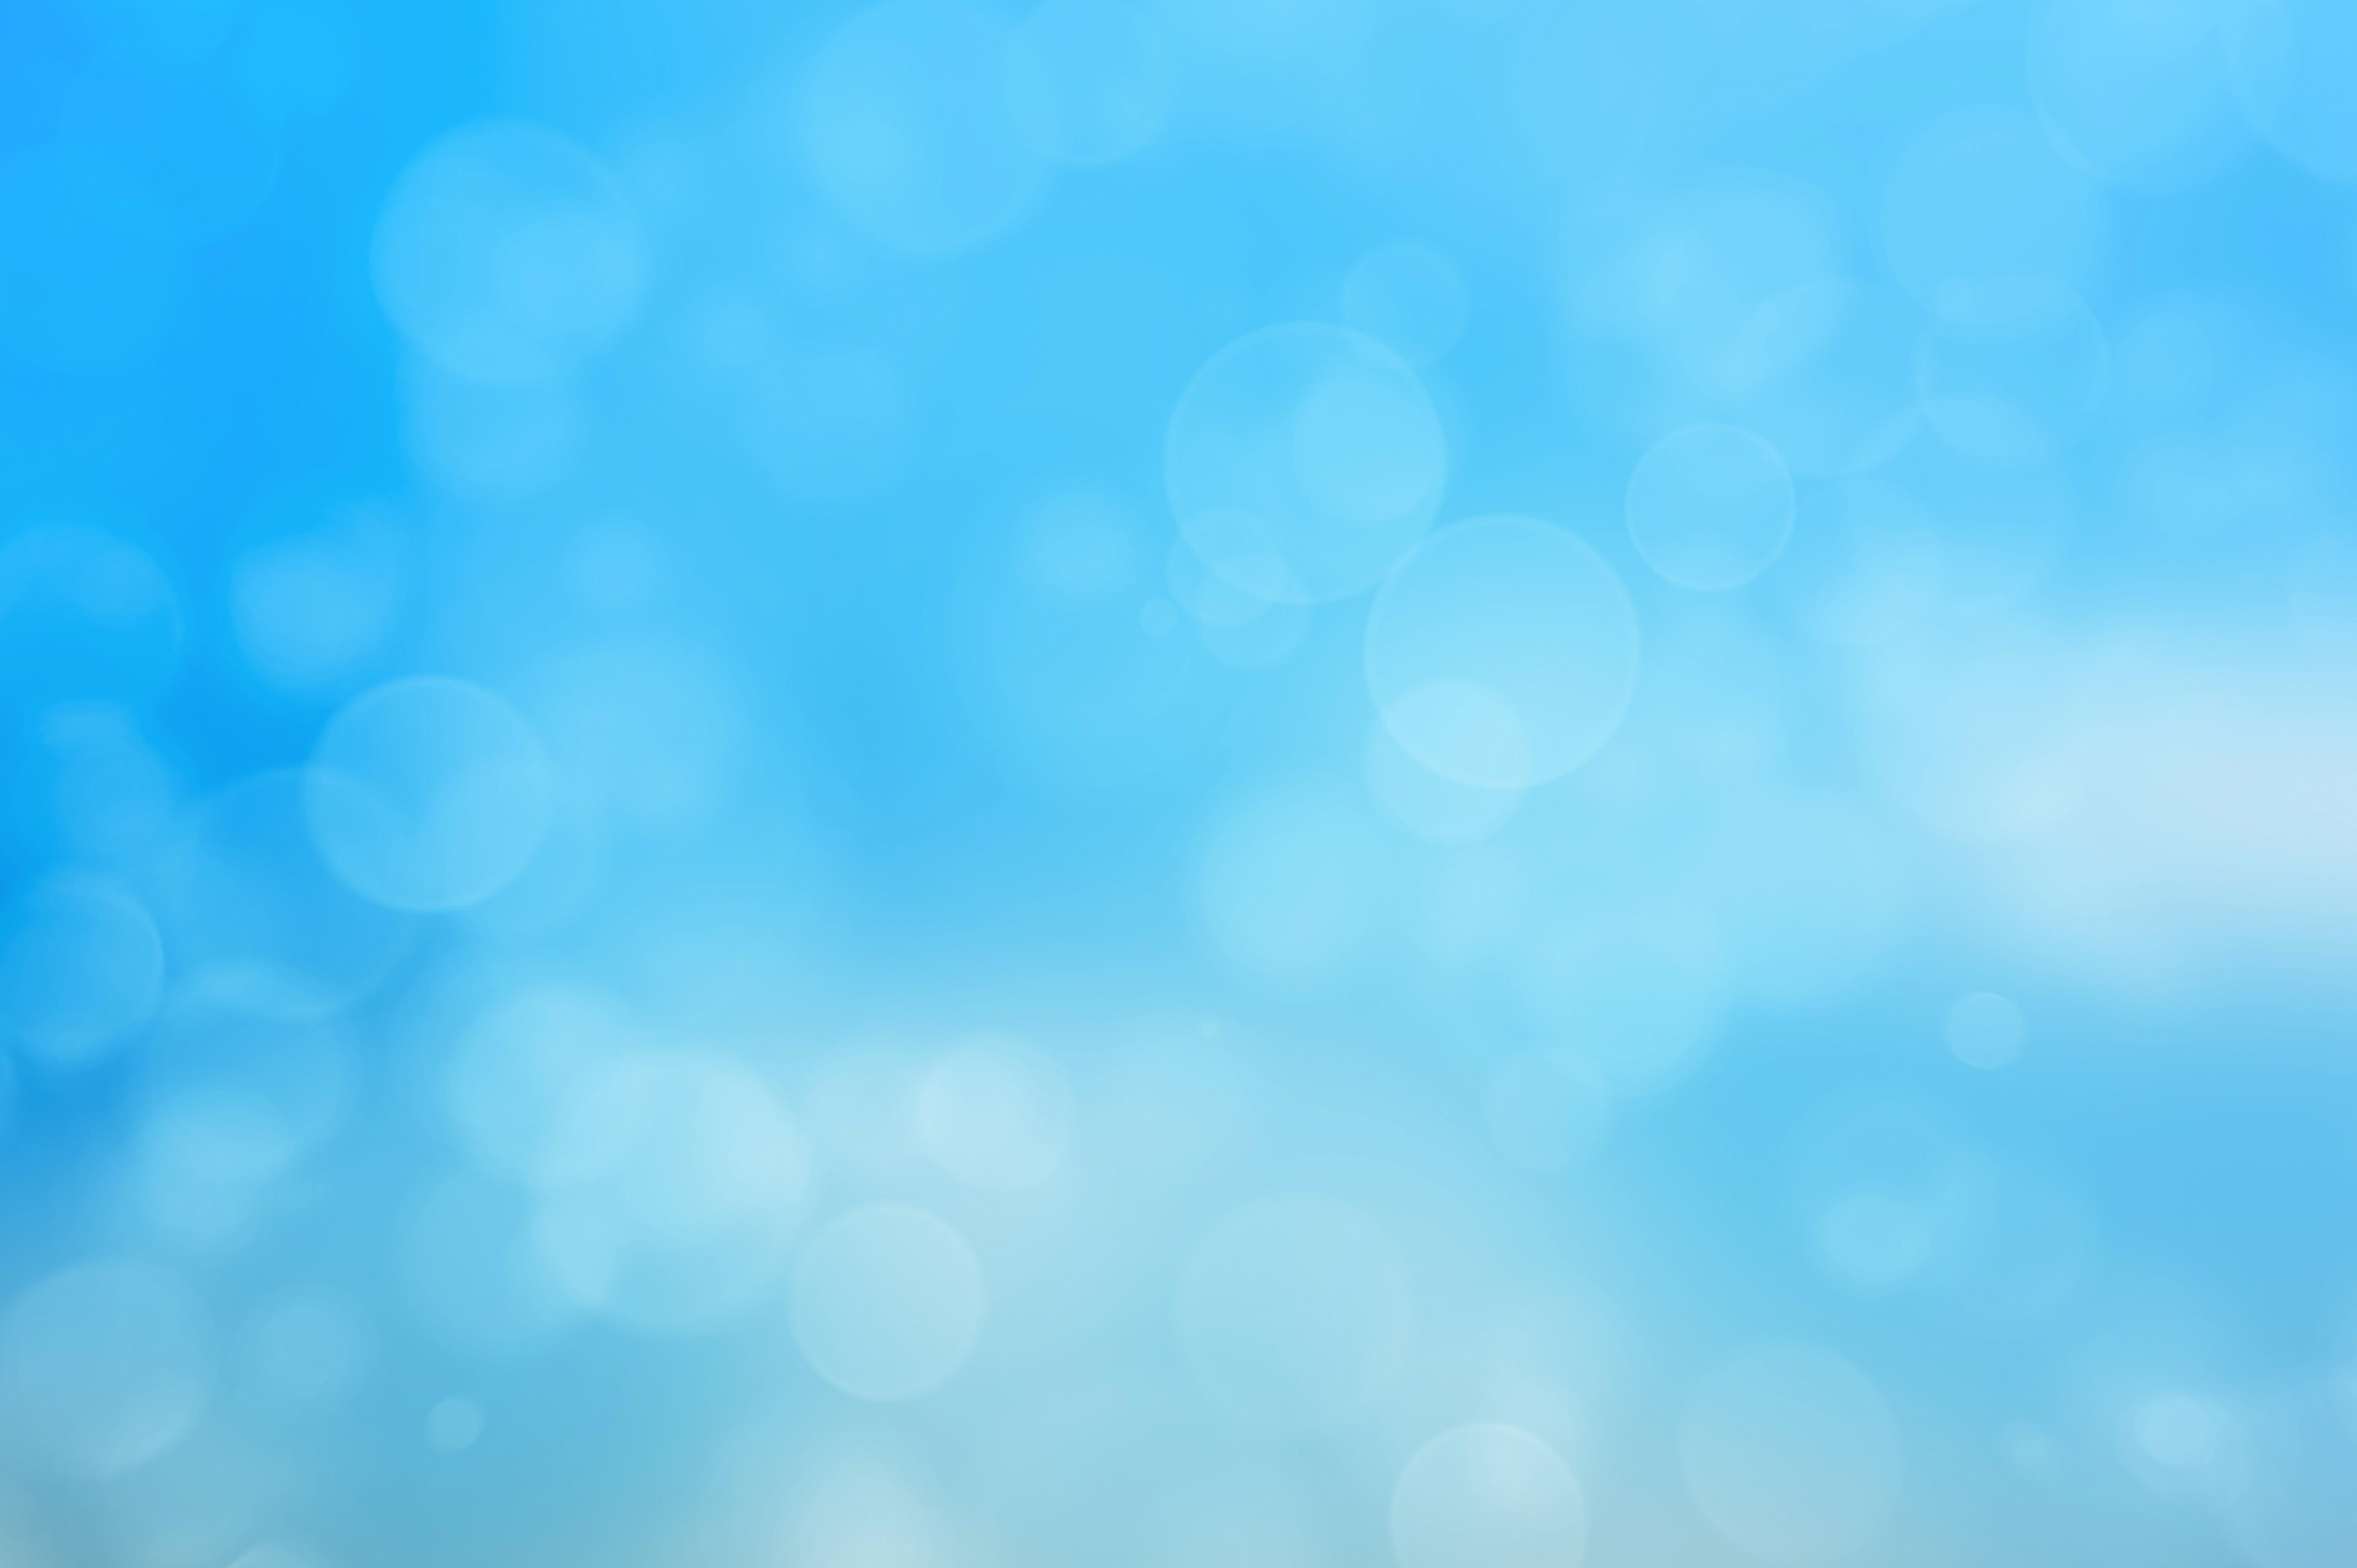 Light Blue Background Clipart.